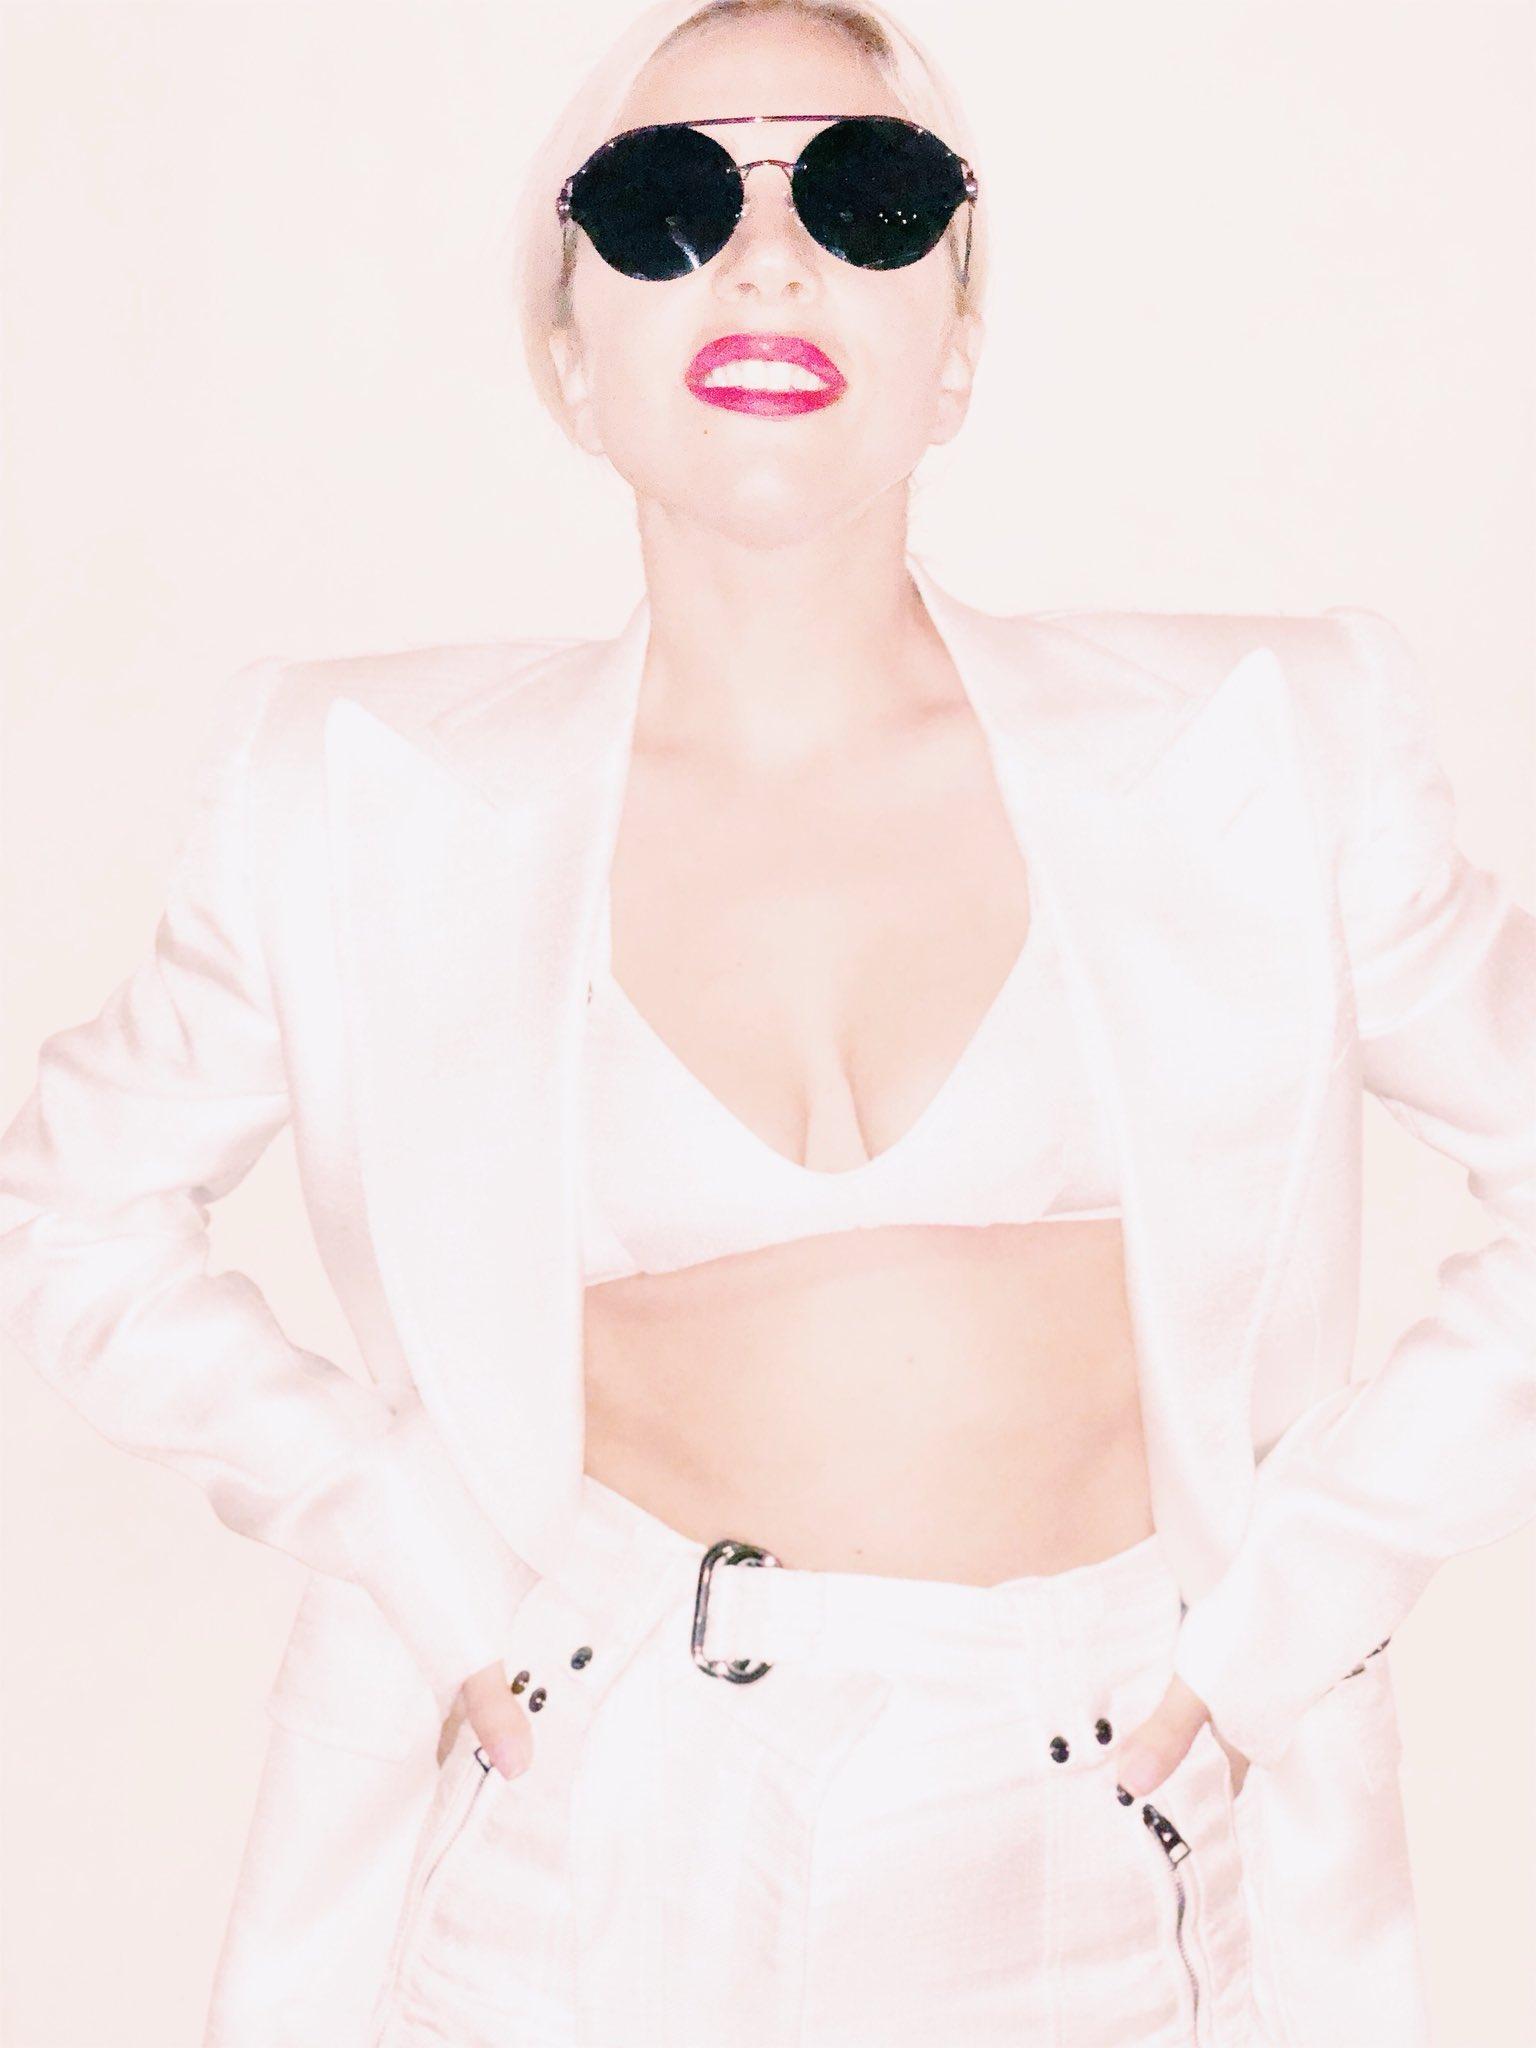 4 - Lady Gaga - Σελίδα 9 DaUp2PeUQAEUyT2